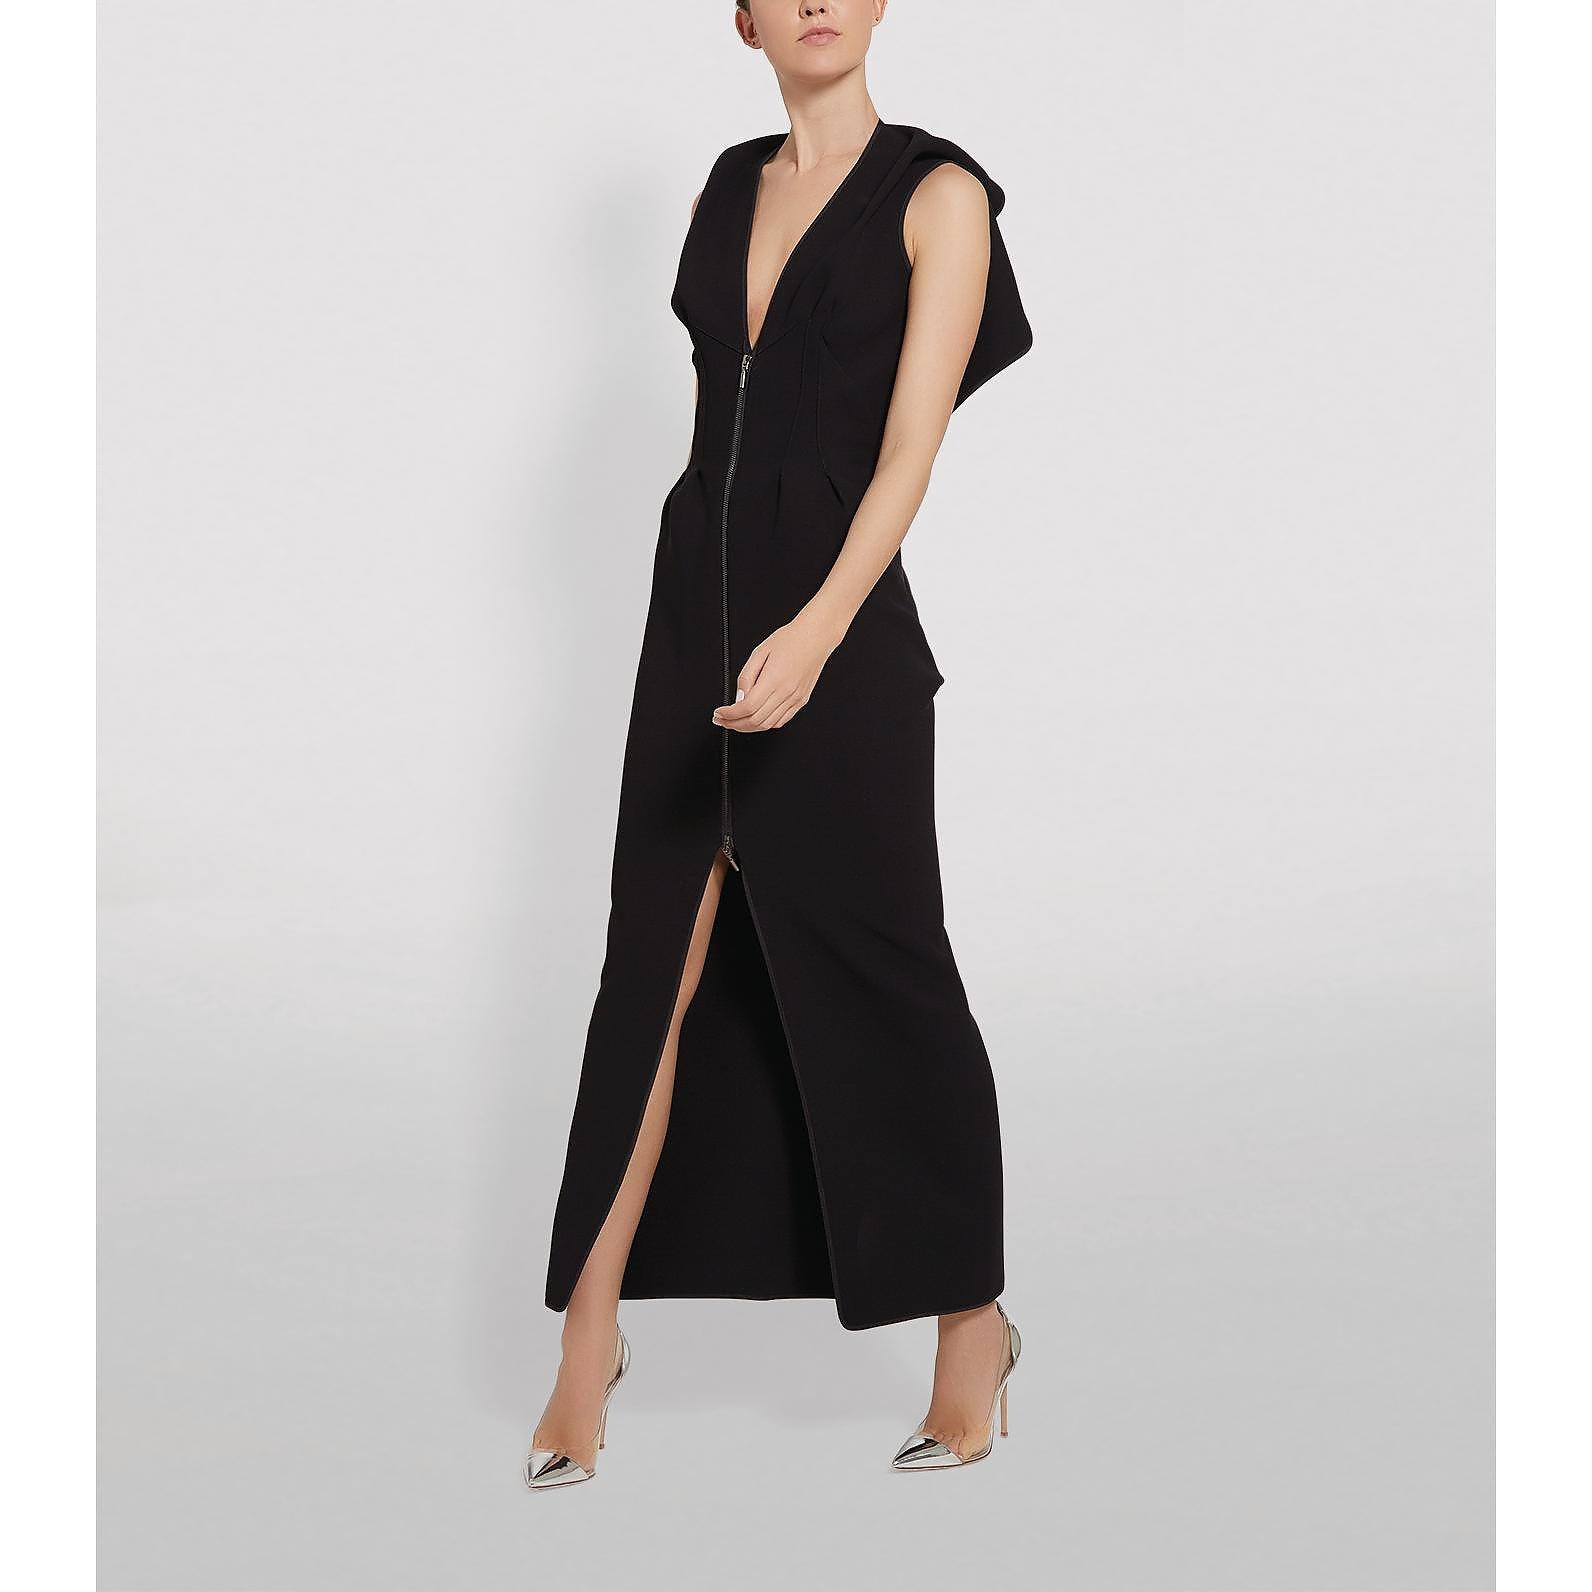 Maticevski Insecta Zip-Front Midi Dress